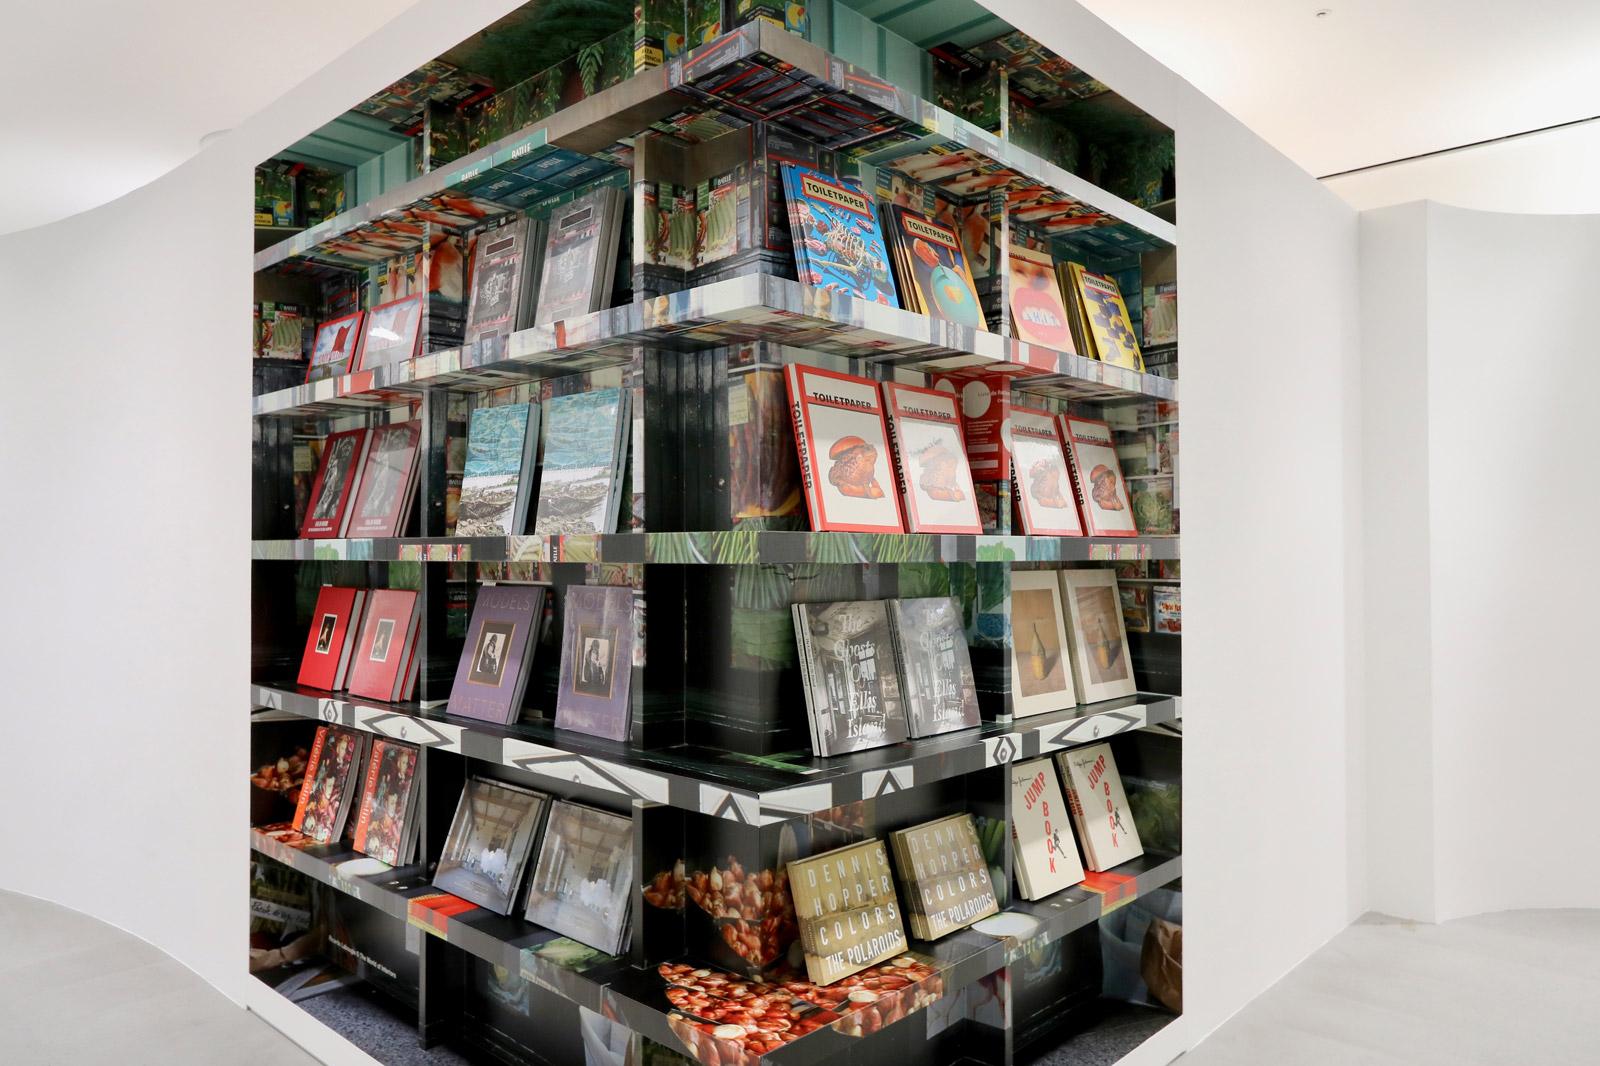 Interior Bookshelf